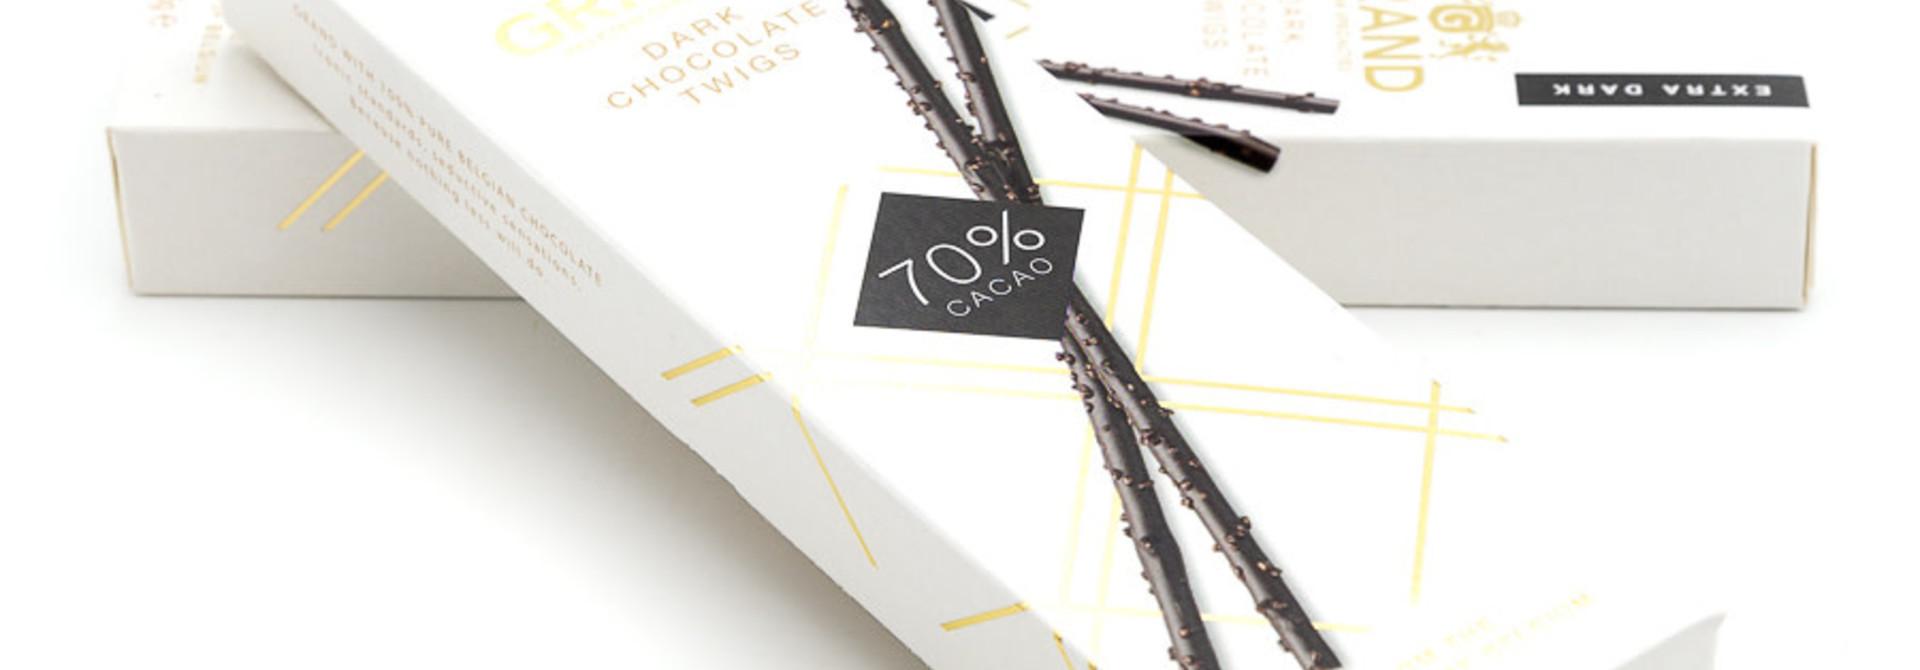 Dark chocolate twigs (extra dark)